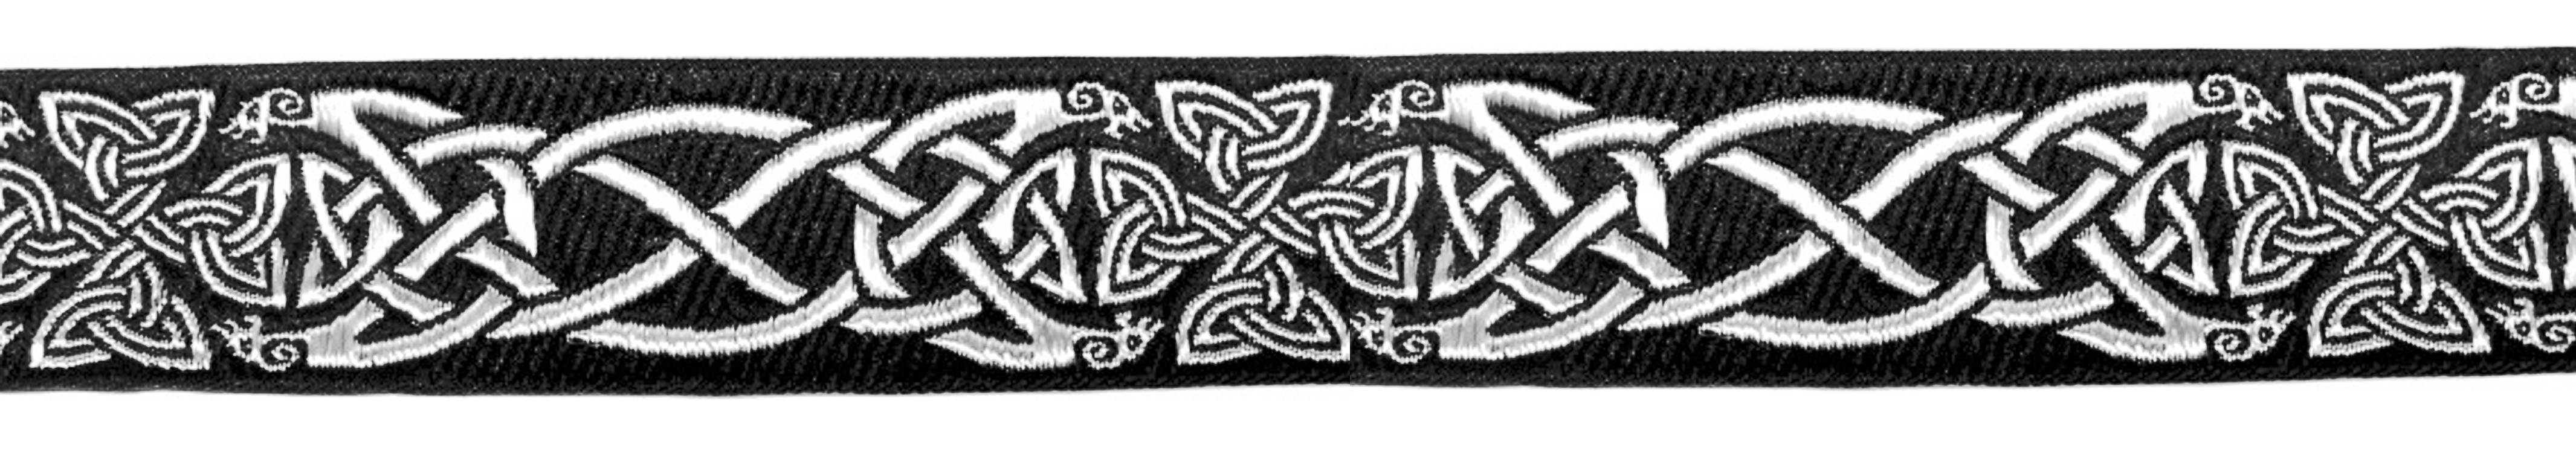 keltische borte